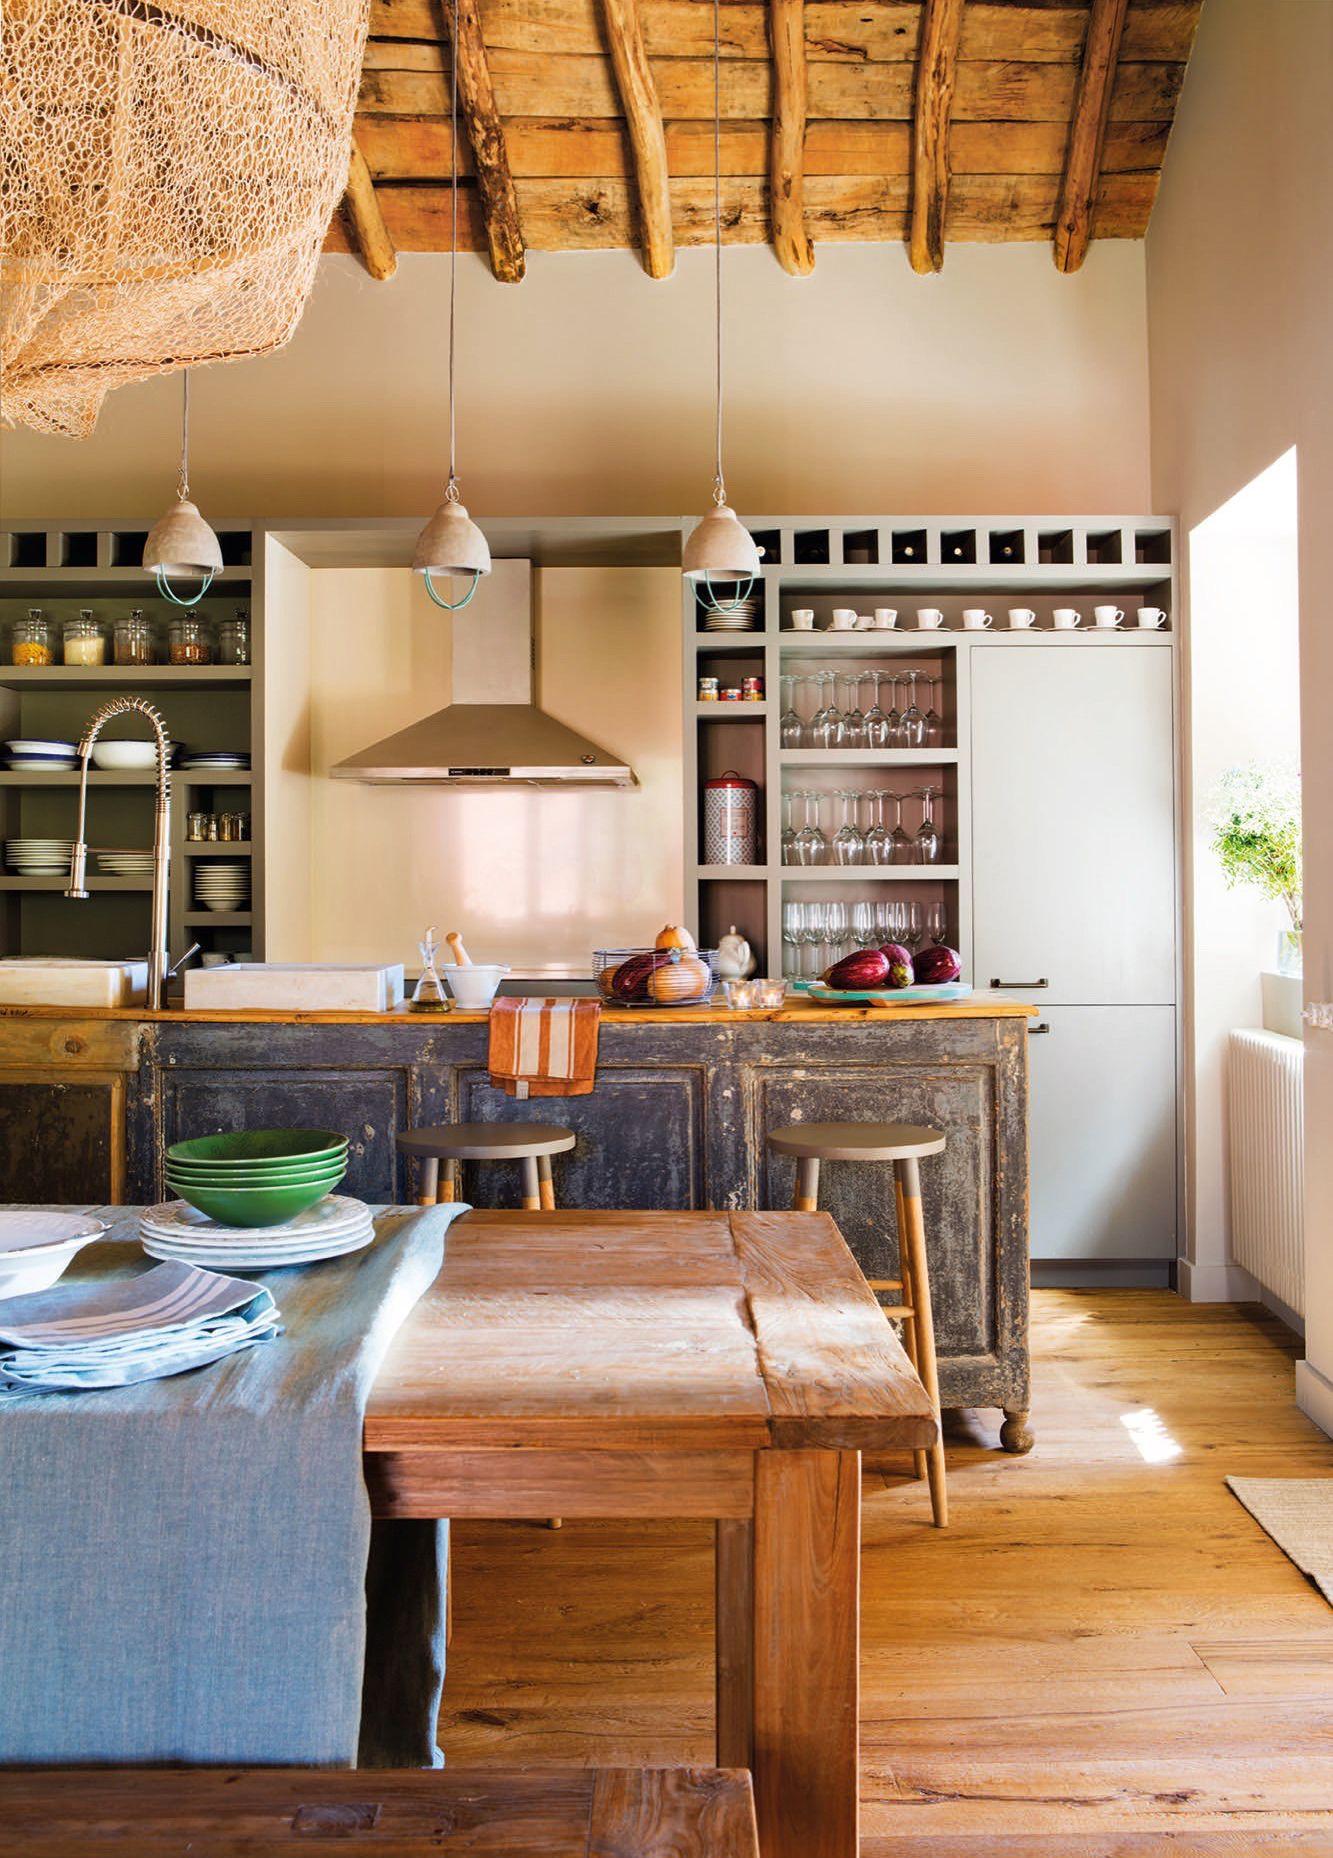 cocina rustica en isla con taburetes | Interiors, Kitchens and House